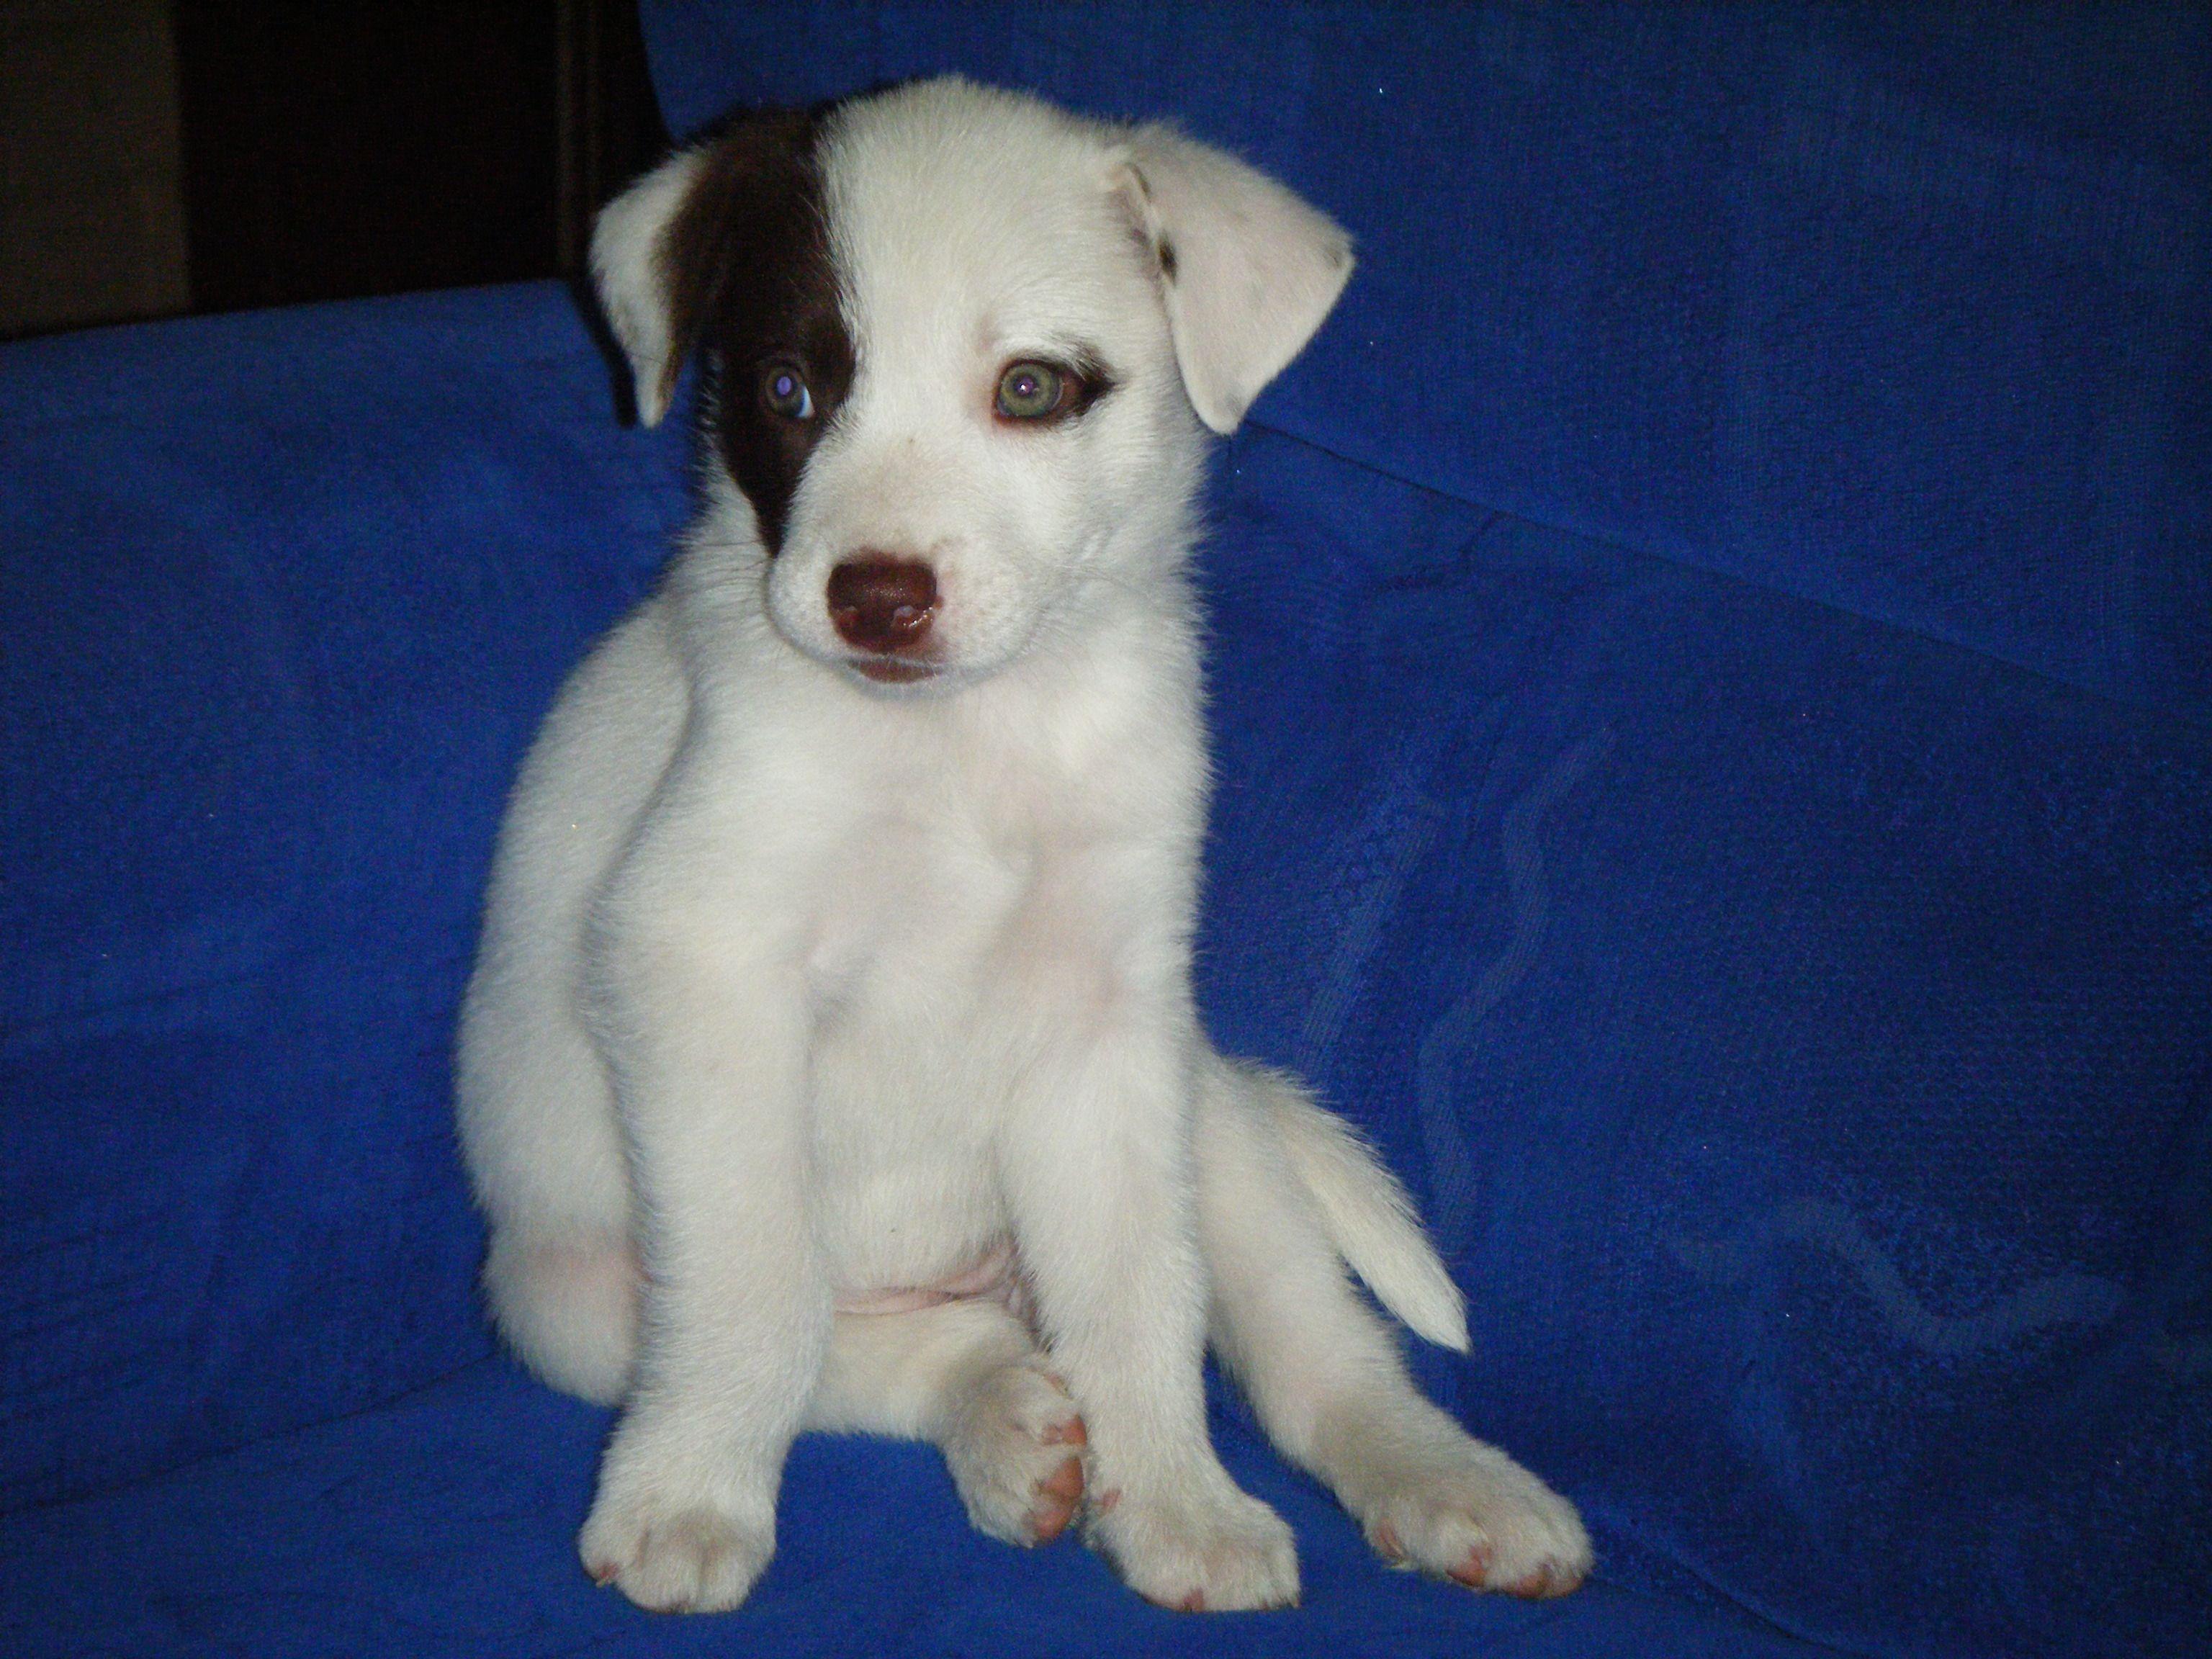 Border Collie X Kelpie My Favorite Dog Breeds Dogs Dog Breeds